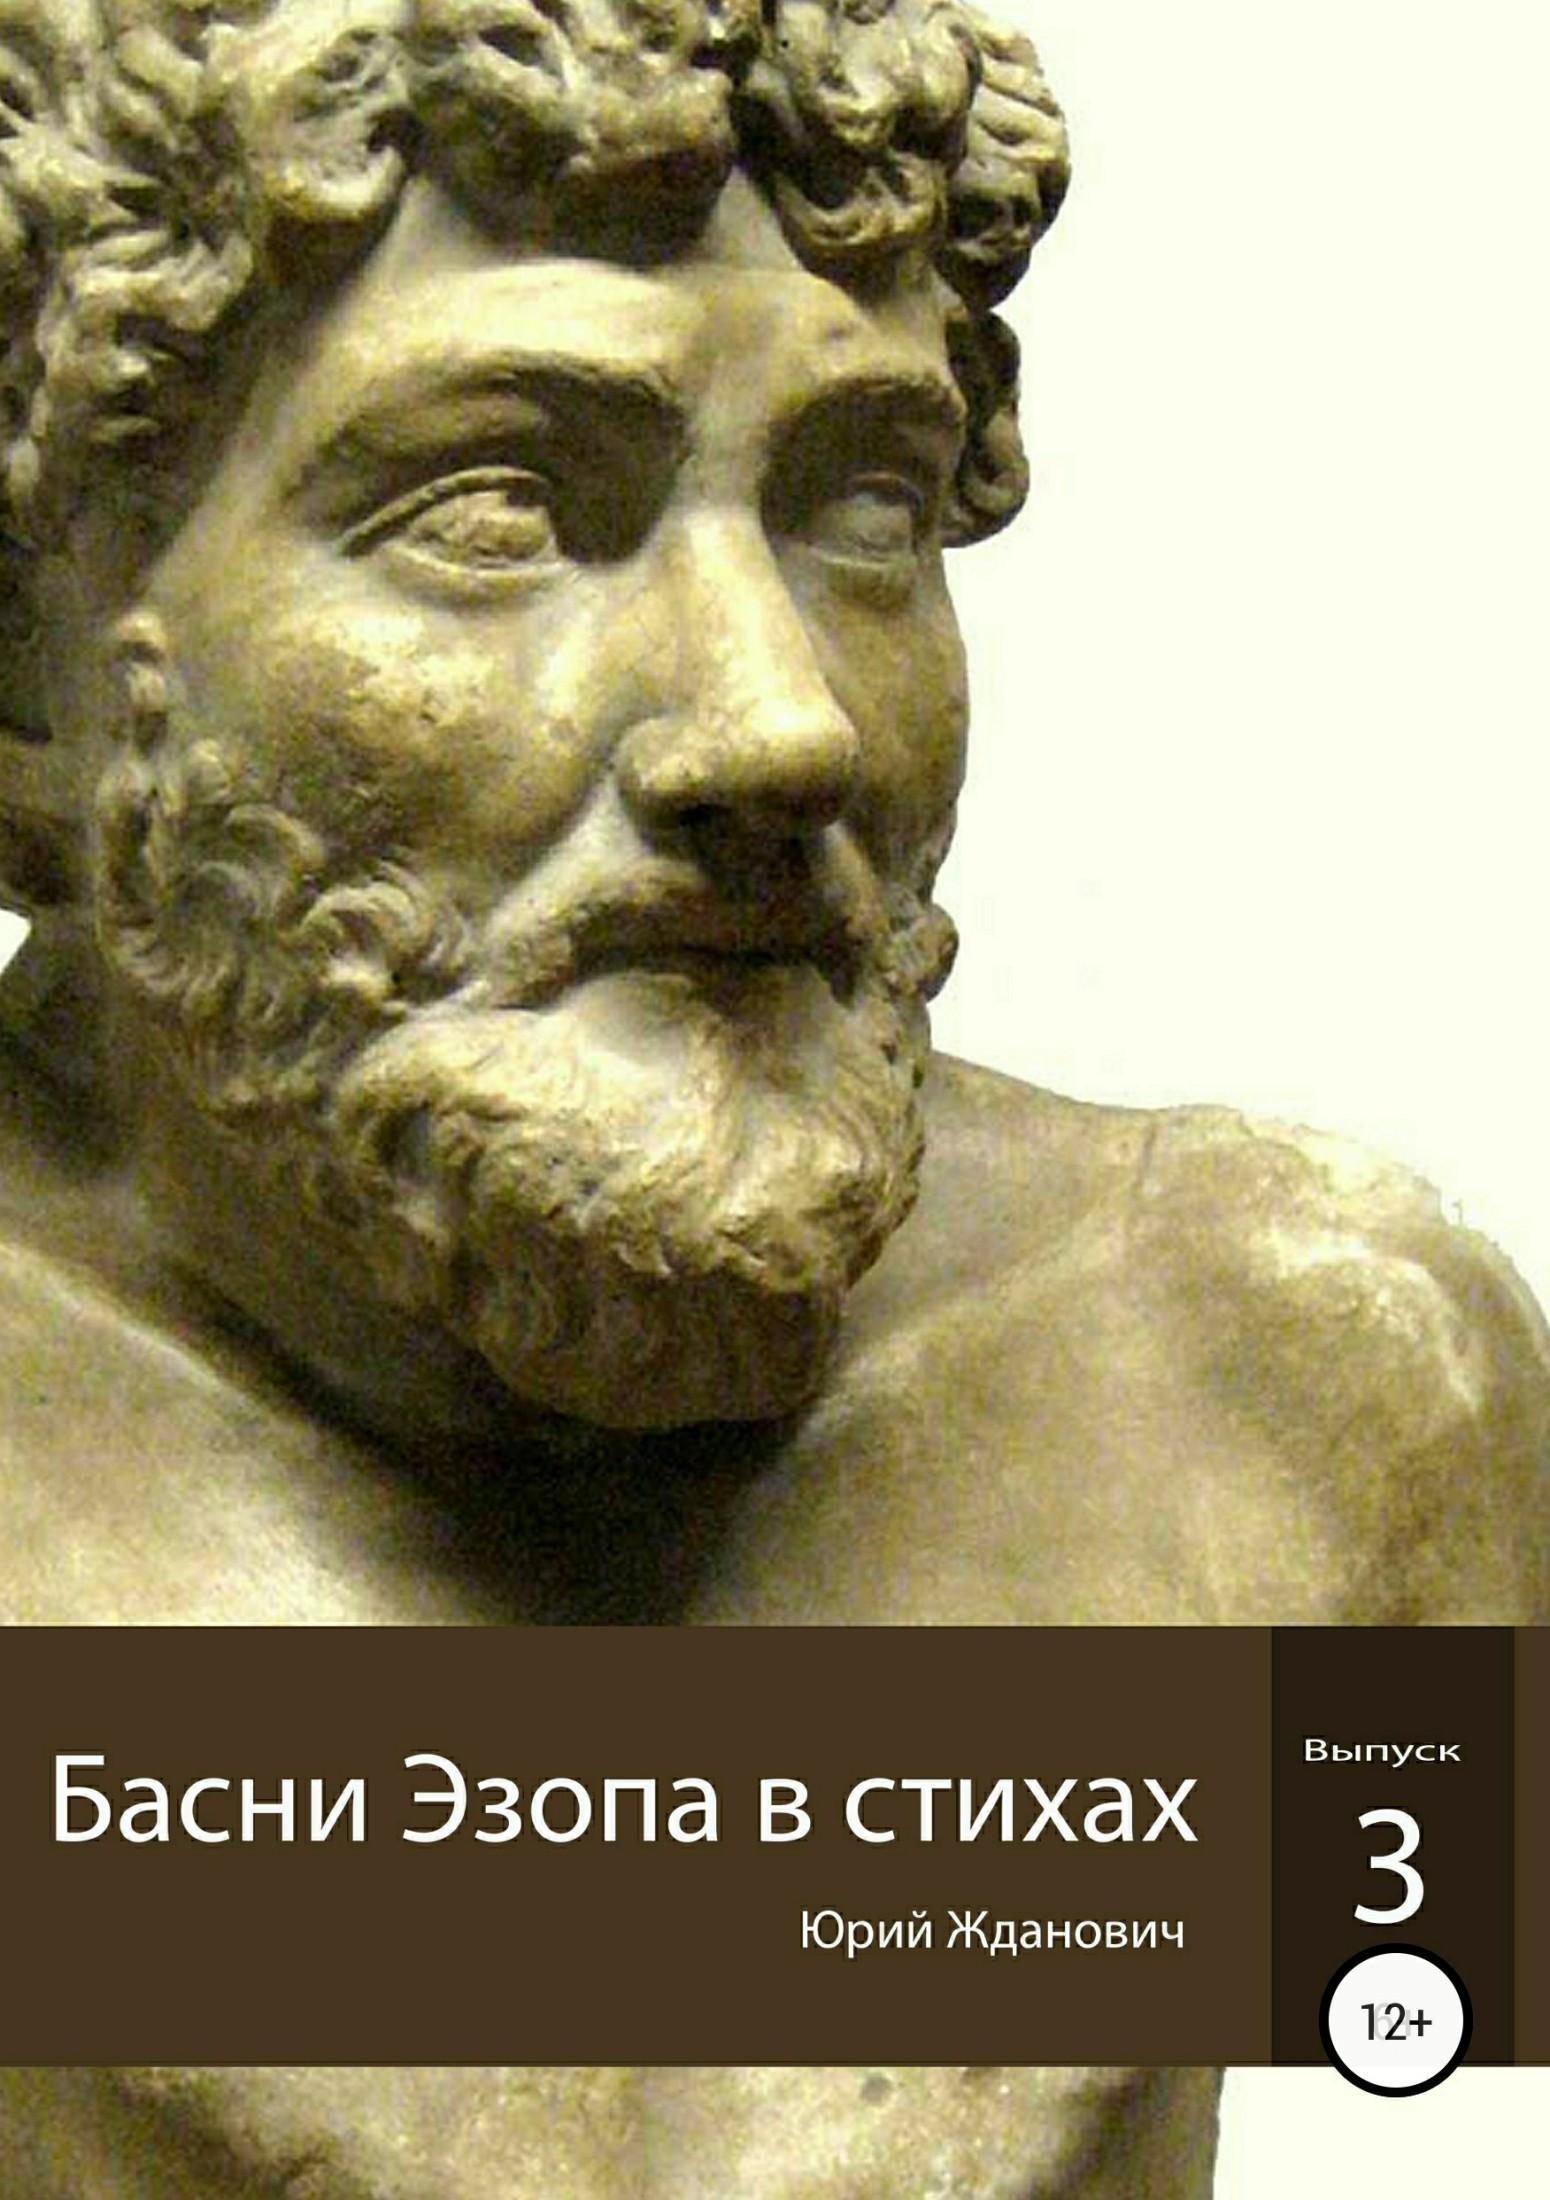 Юрий Михайлович Жданович Басни Эзопа в стихах. Выпуск 3 мастер класс басни с моралью